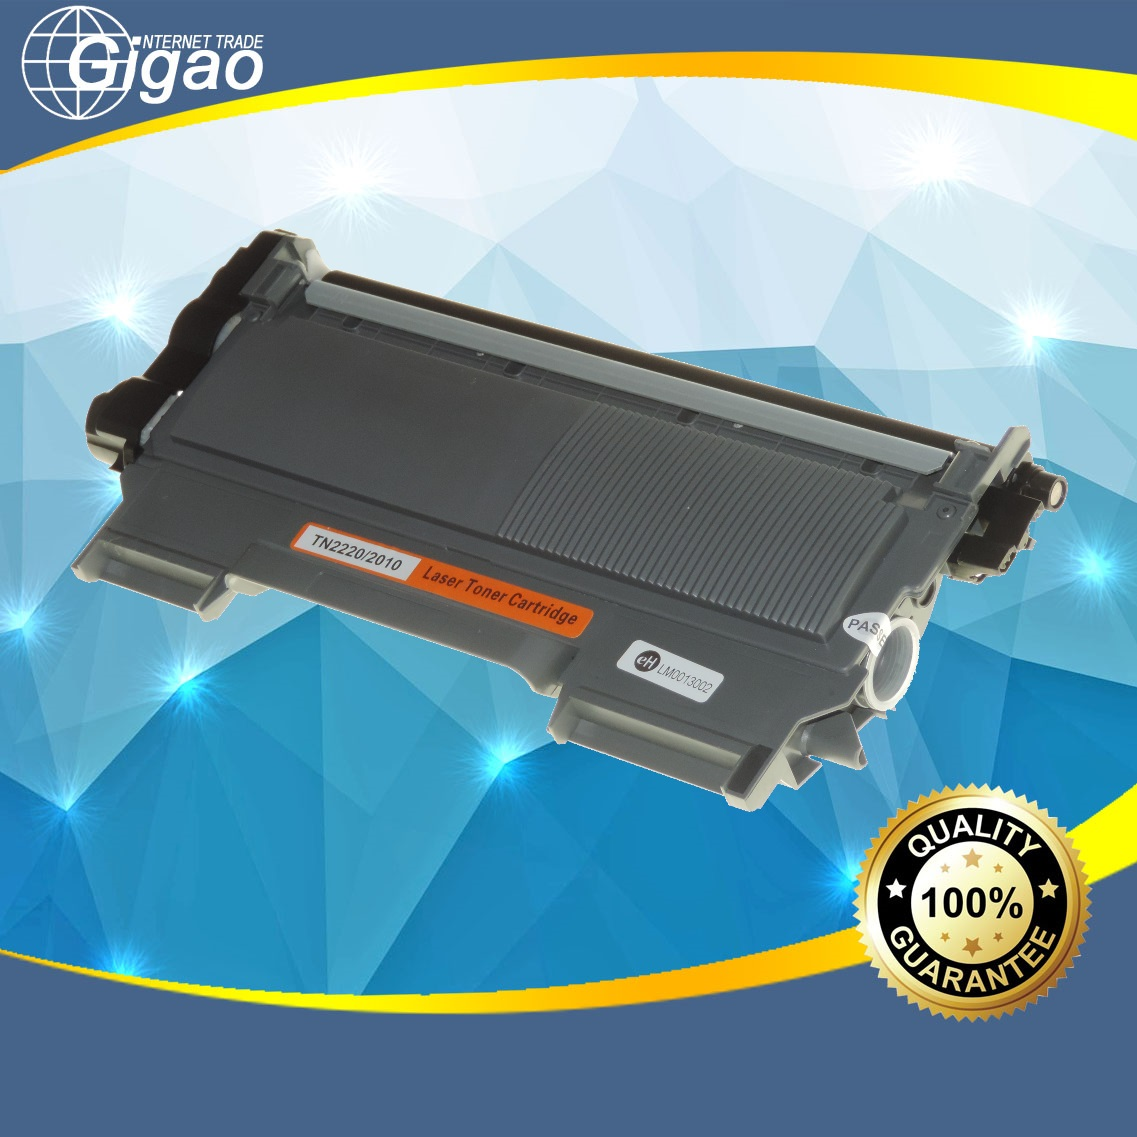 Gigao Laser Tonerkassette kompatibel Brother TN-2220 für MFC-7860DN